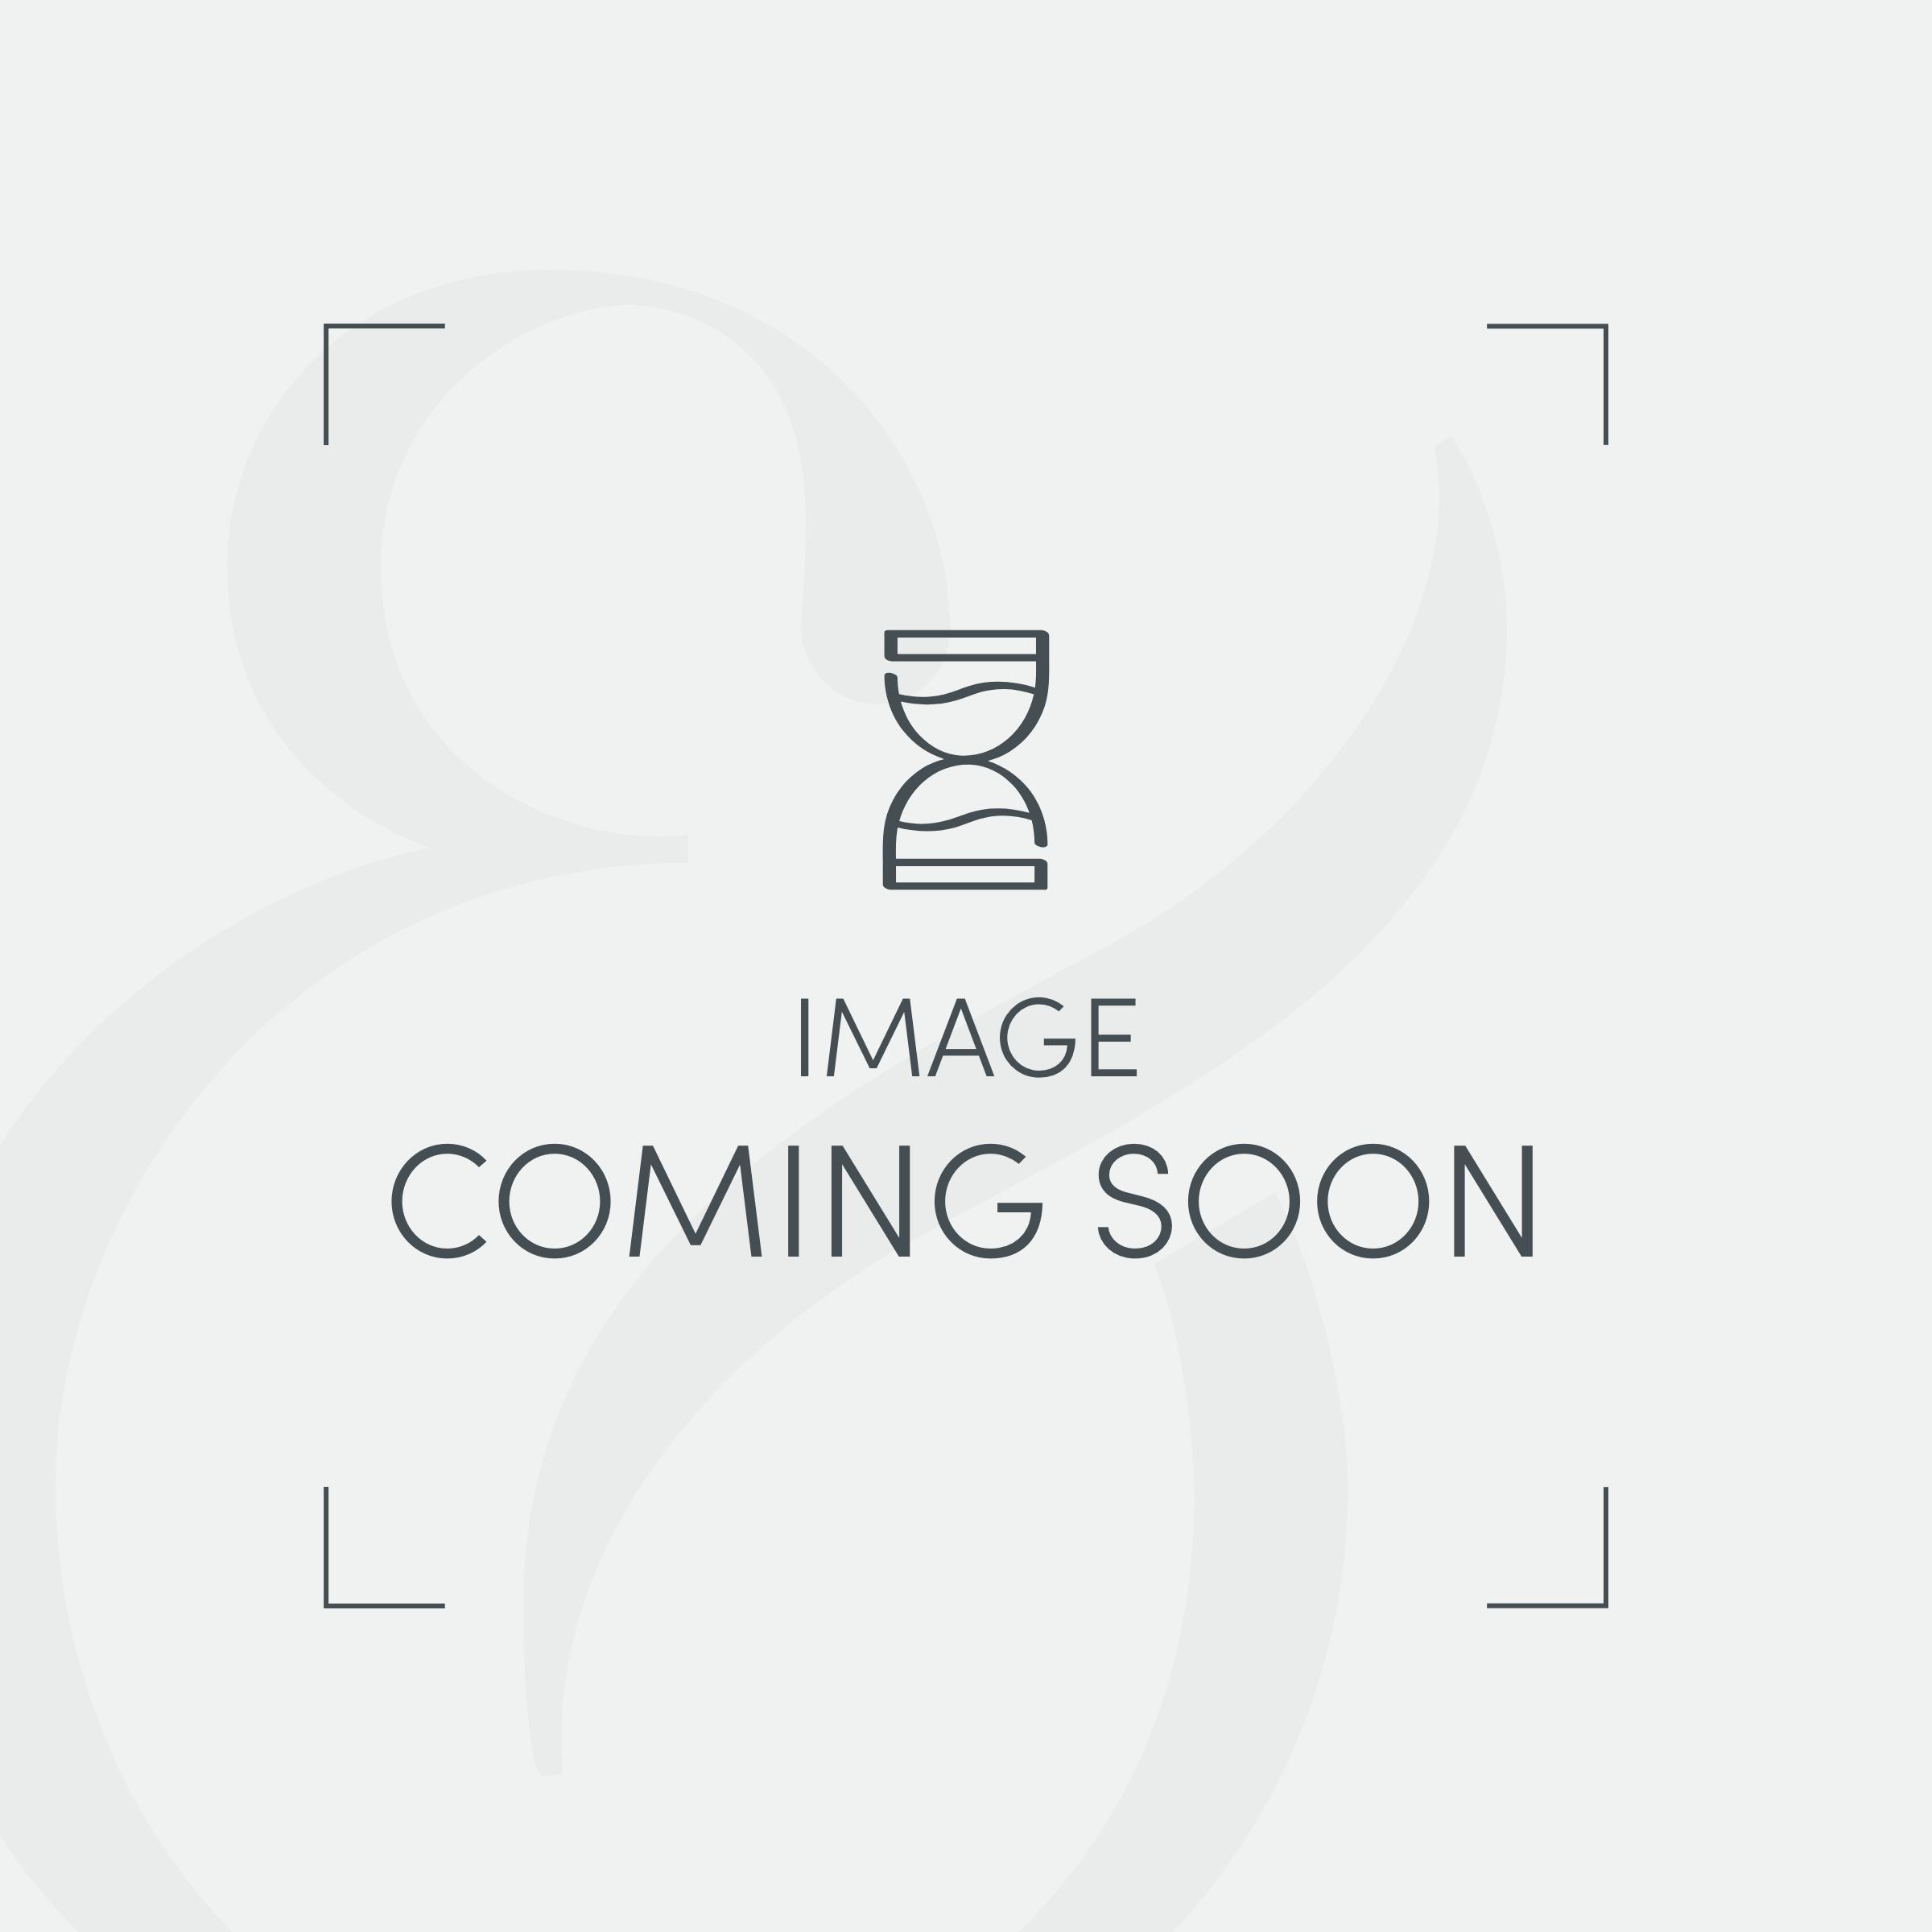 Special Buy 500TC Egyptian Cotton Sateen - King Duvet Cover - White